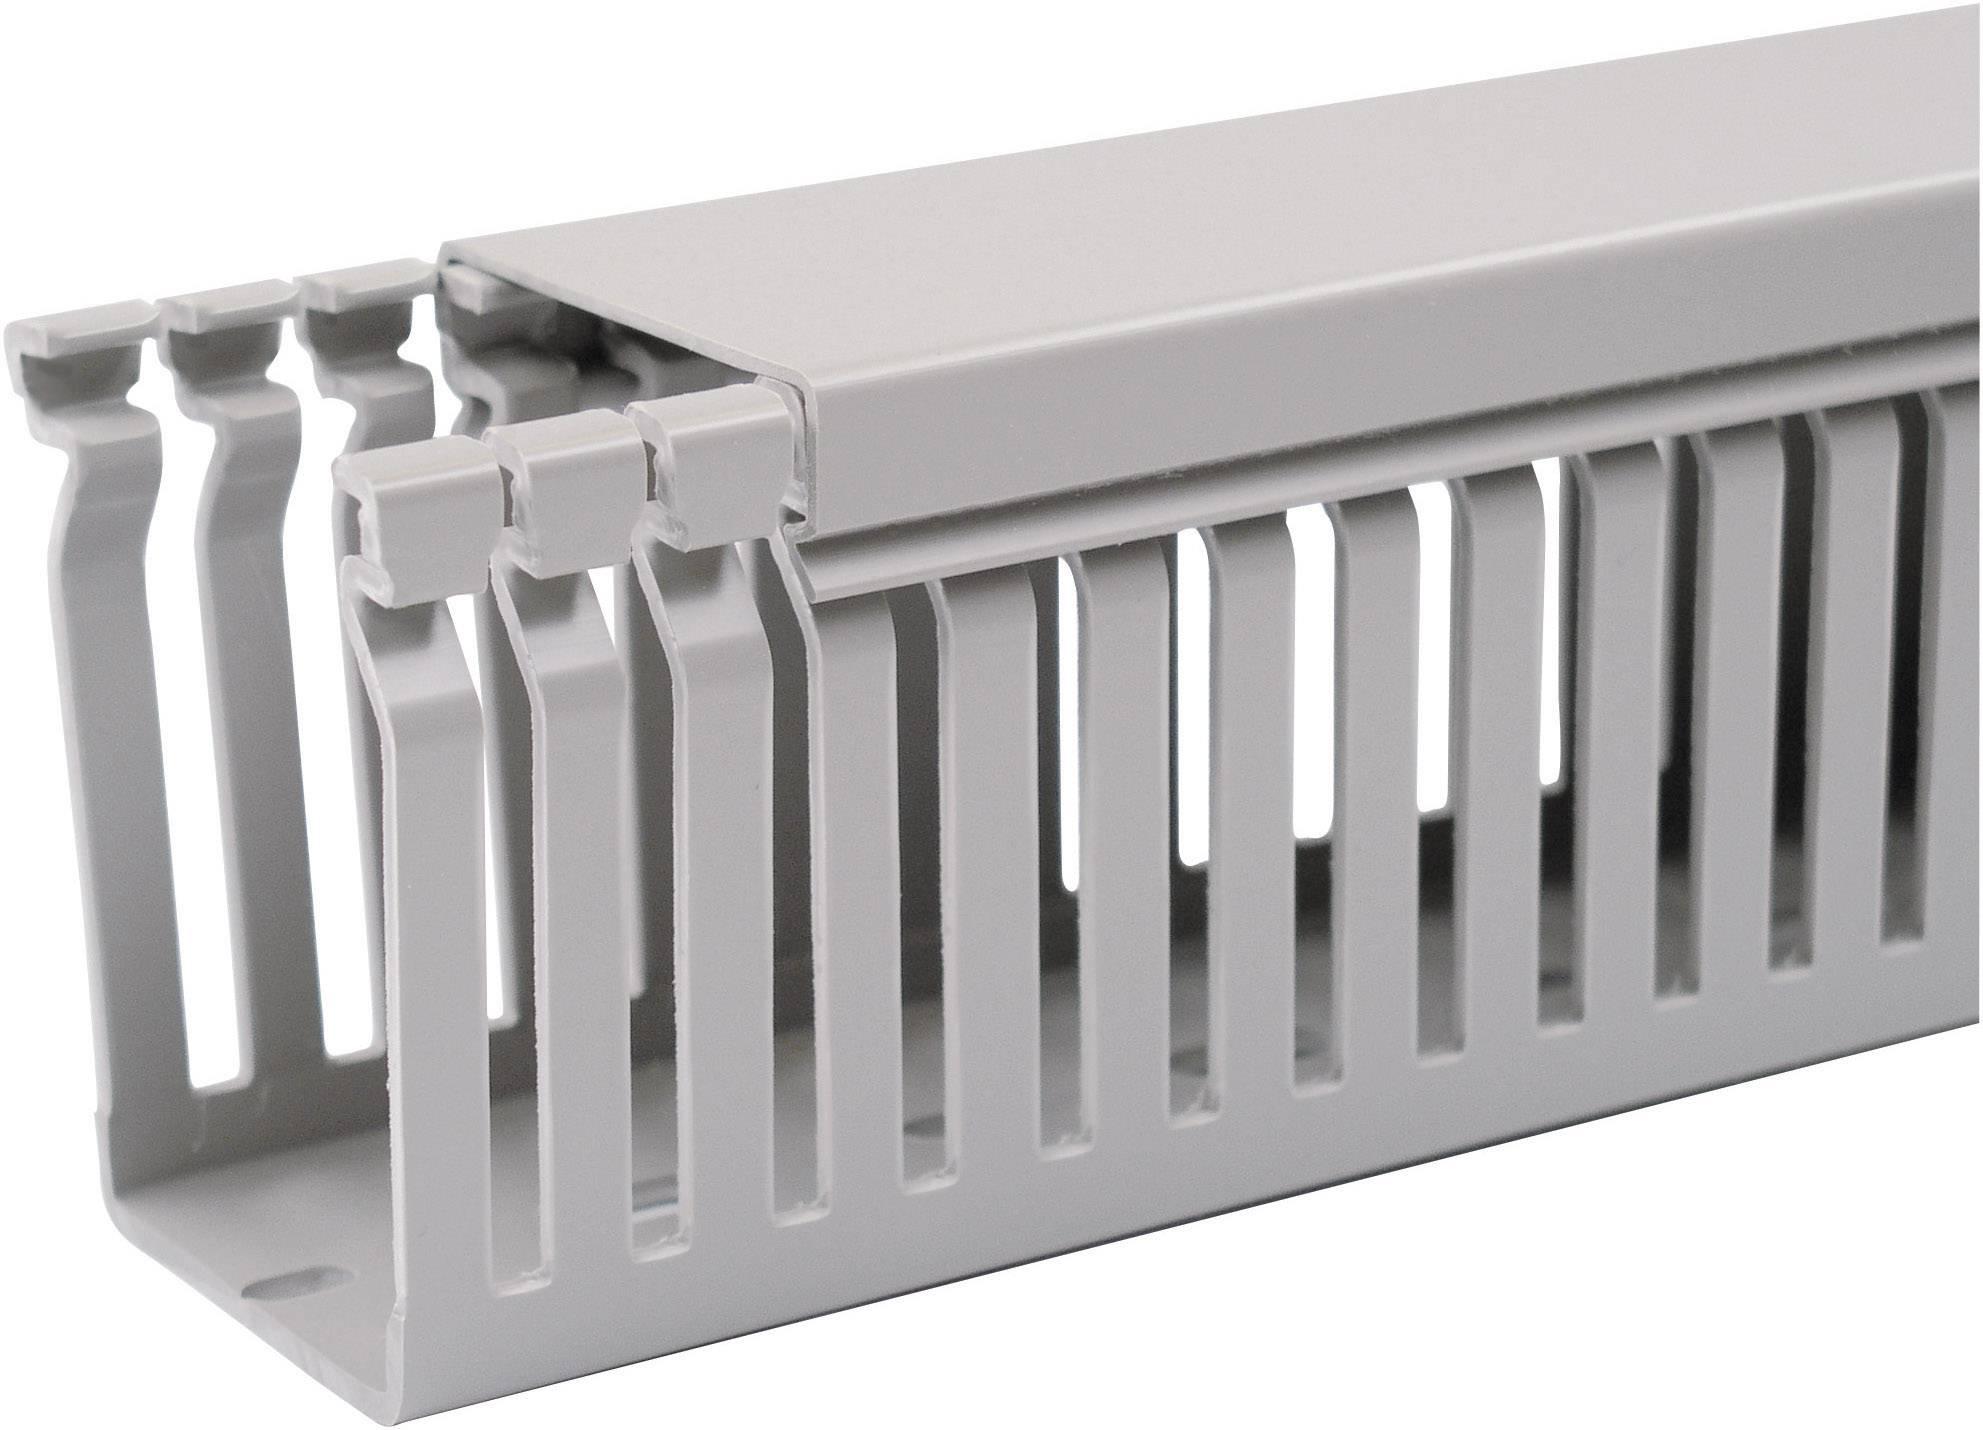 Elektroinstalační lišta OBO Bettermann, 6178005, 25x30 mm, 2 m, šedá